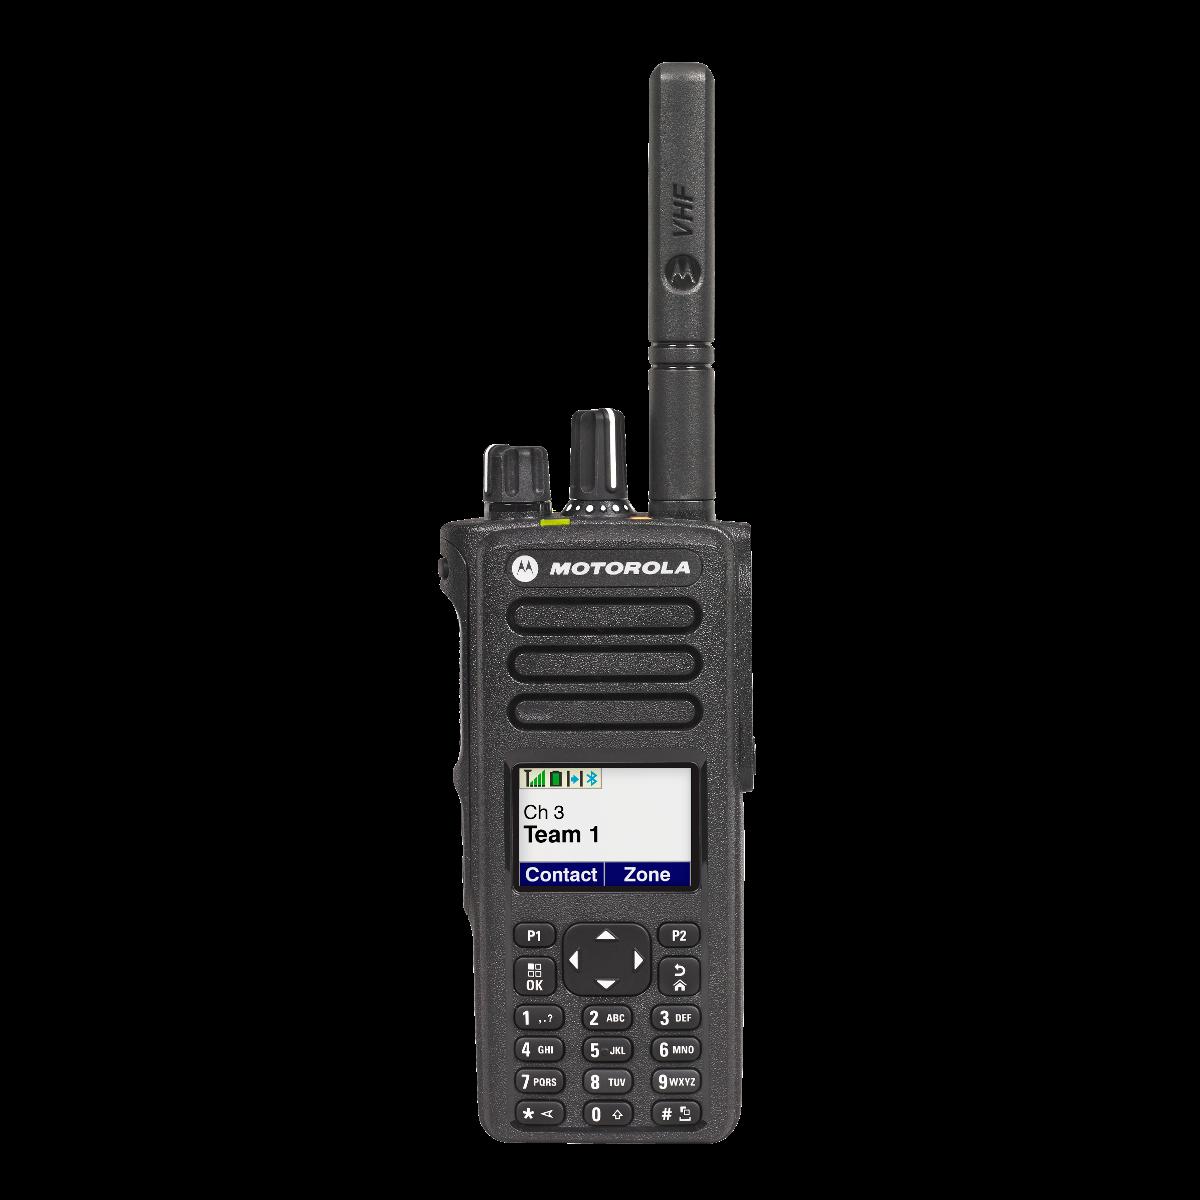 Motorola DM4800e